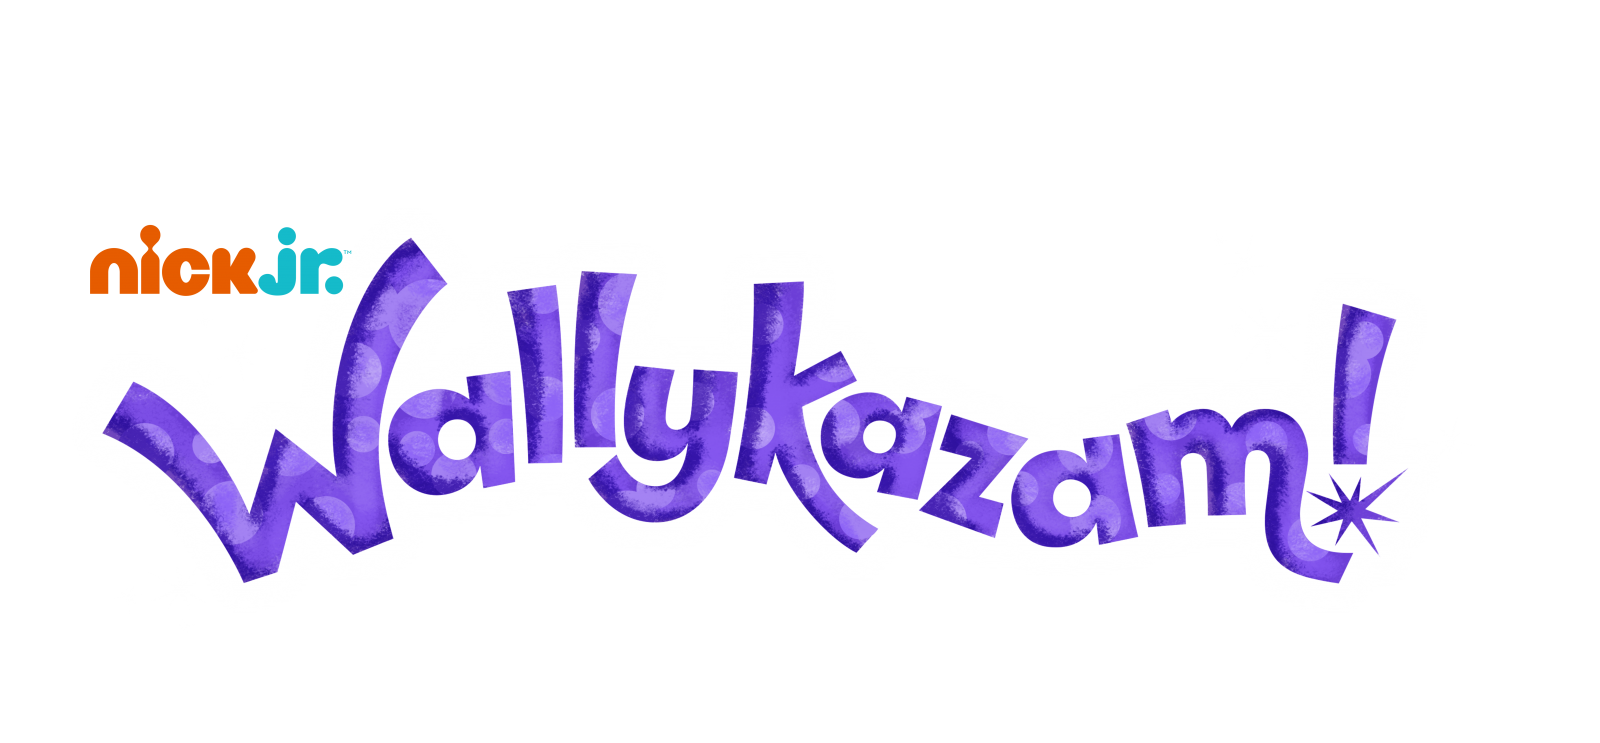 Nickjr_Wallykazam_logo (2).png